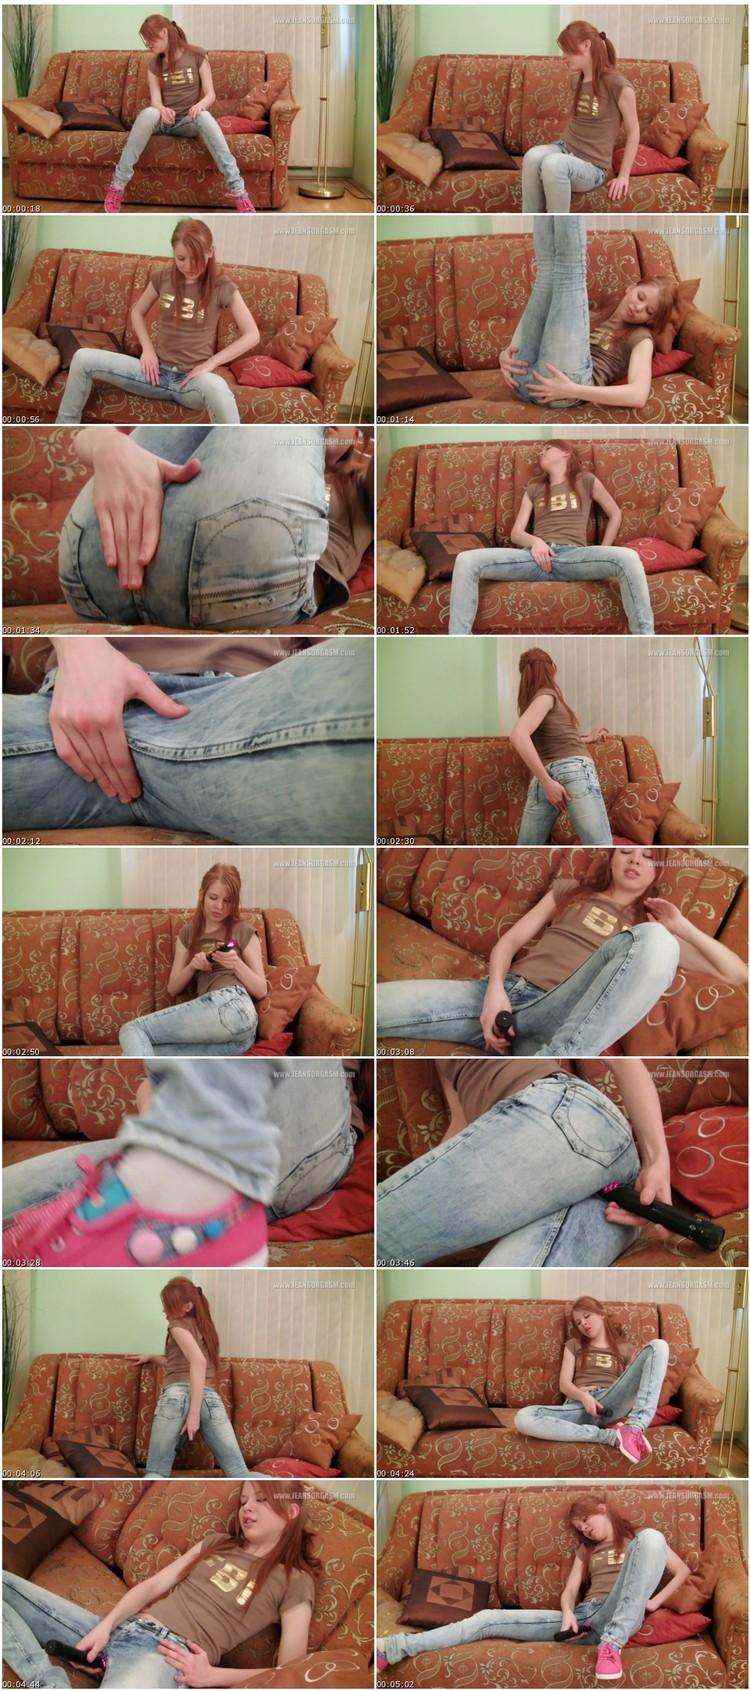 jeans046_thumb,